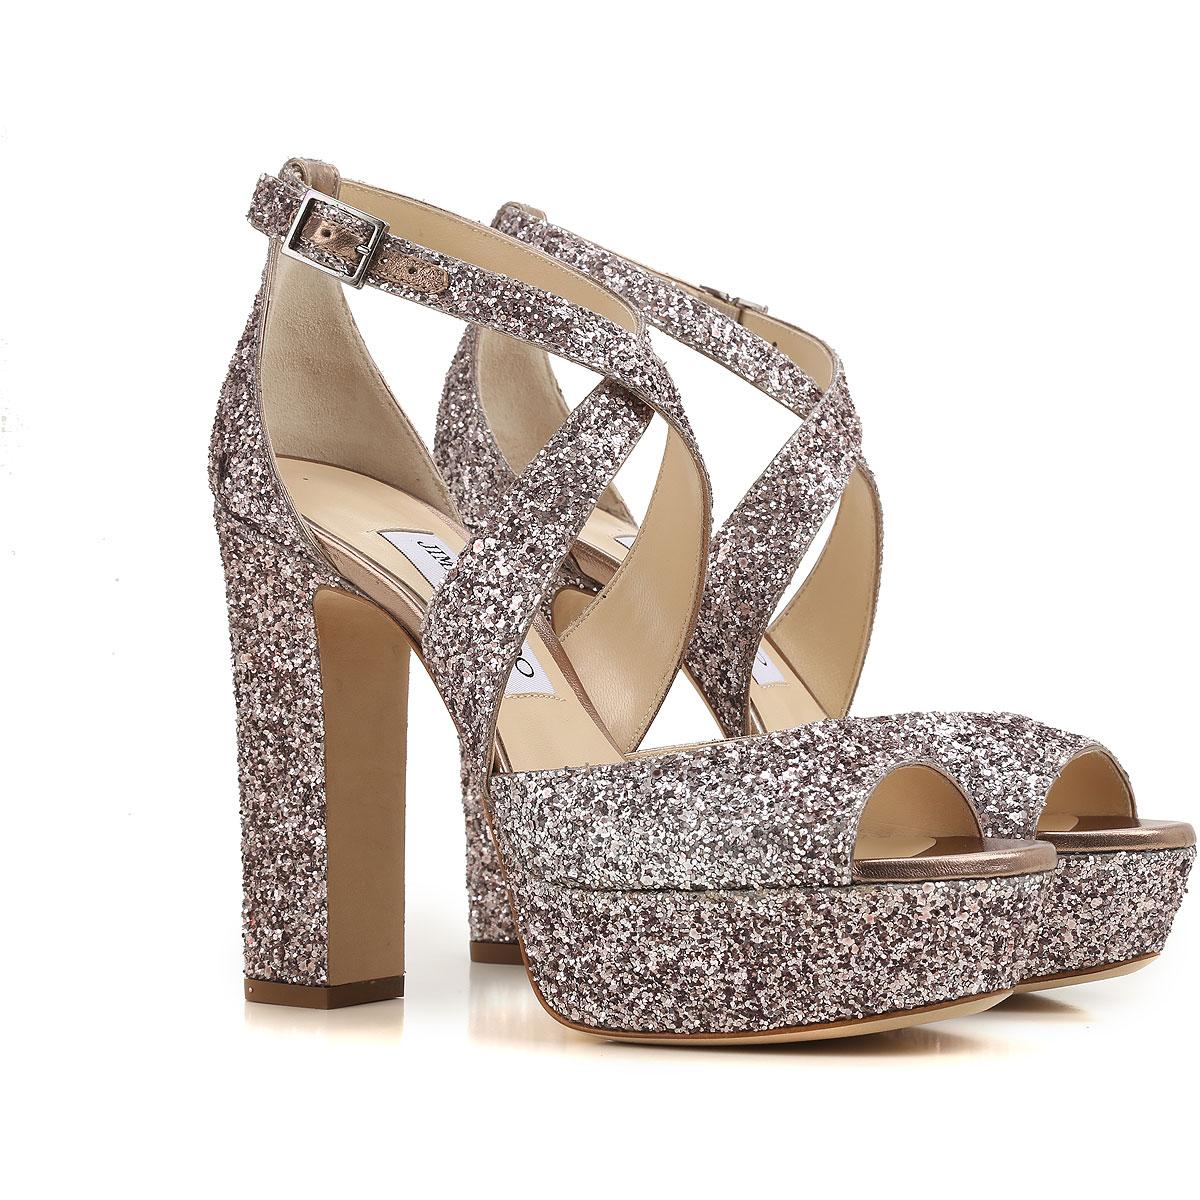 chaussures femme jimmy choo code produit april 120 xlc. Black Bedroom Furniture Sets. Home Design Ideas